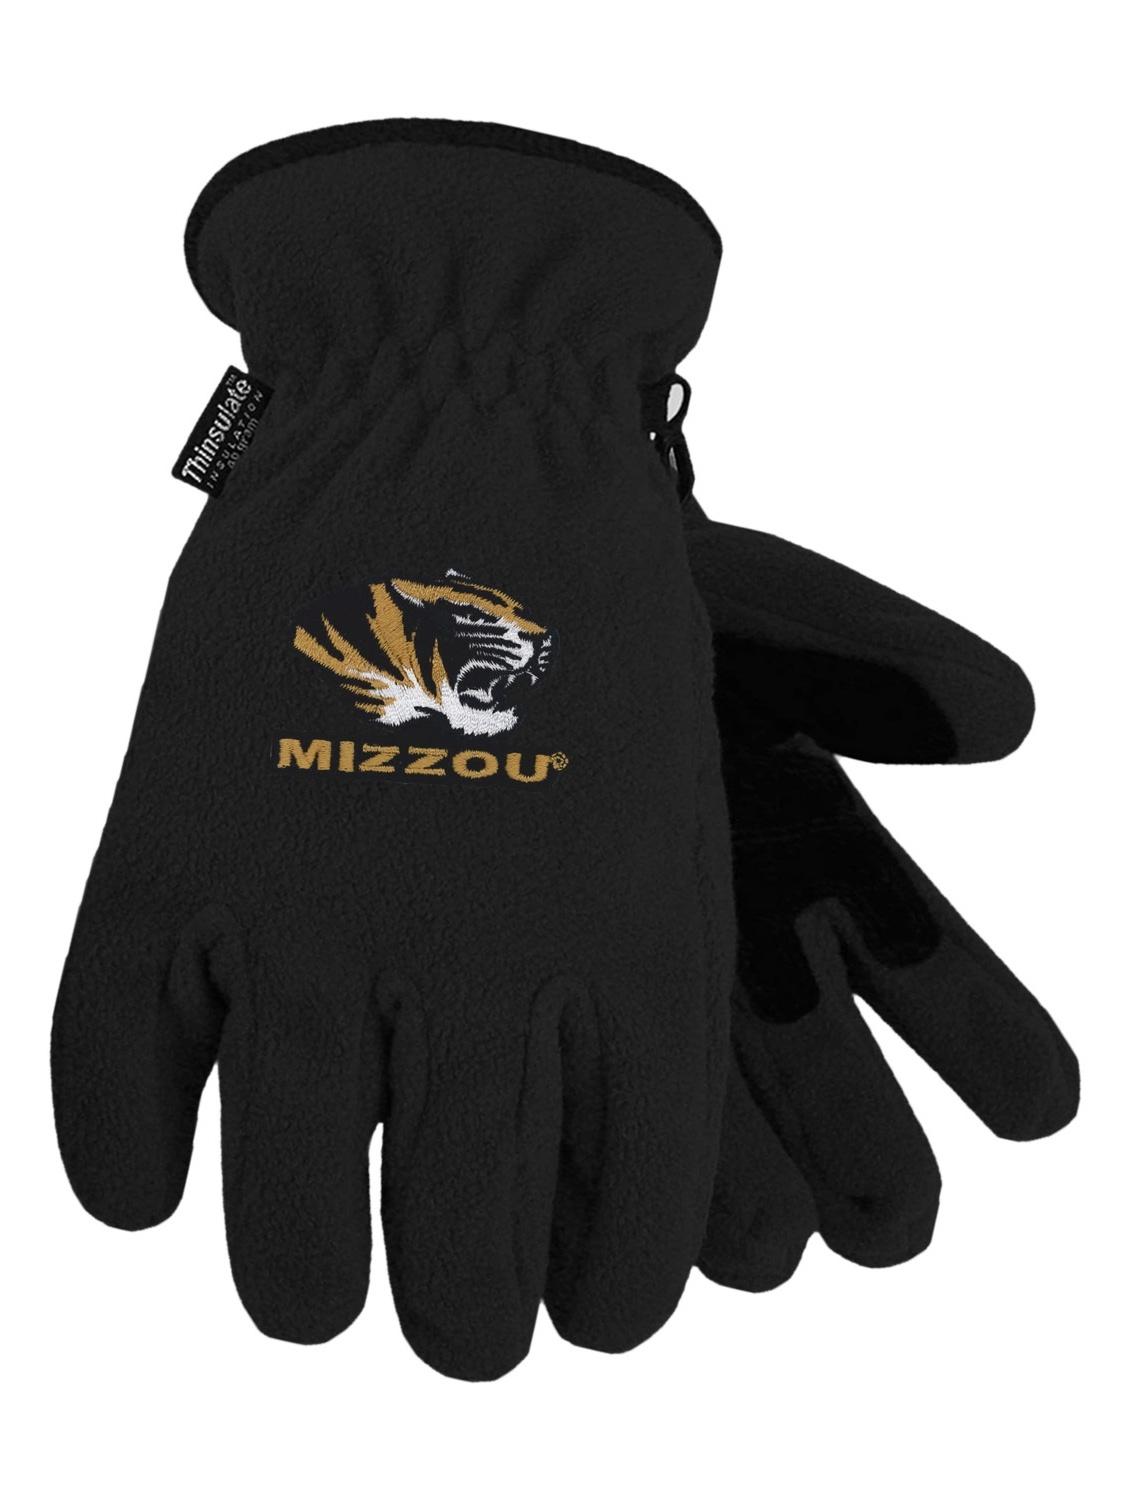 University of Missouri Heavy-Weight Fleece Gloves by